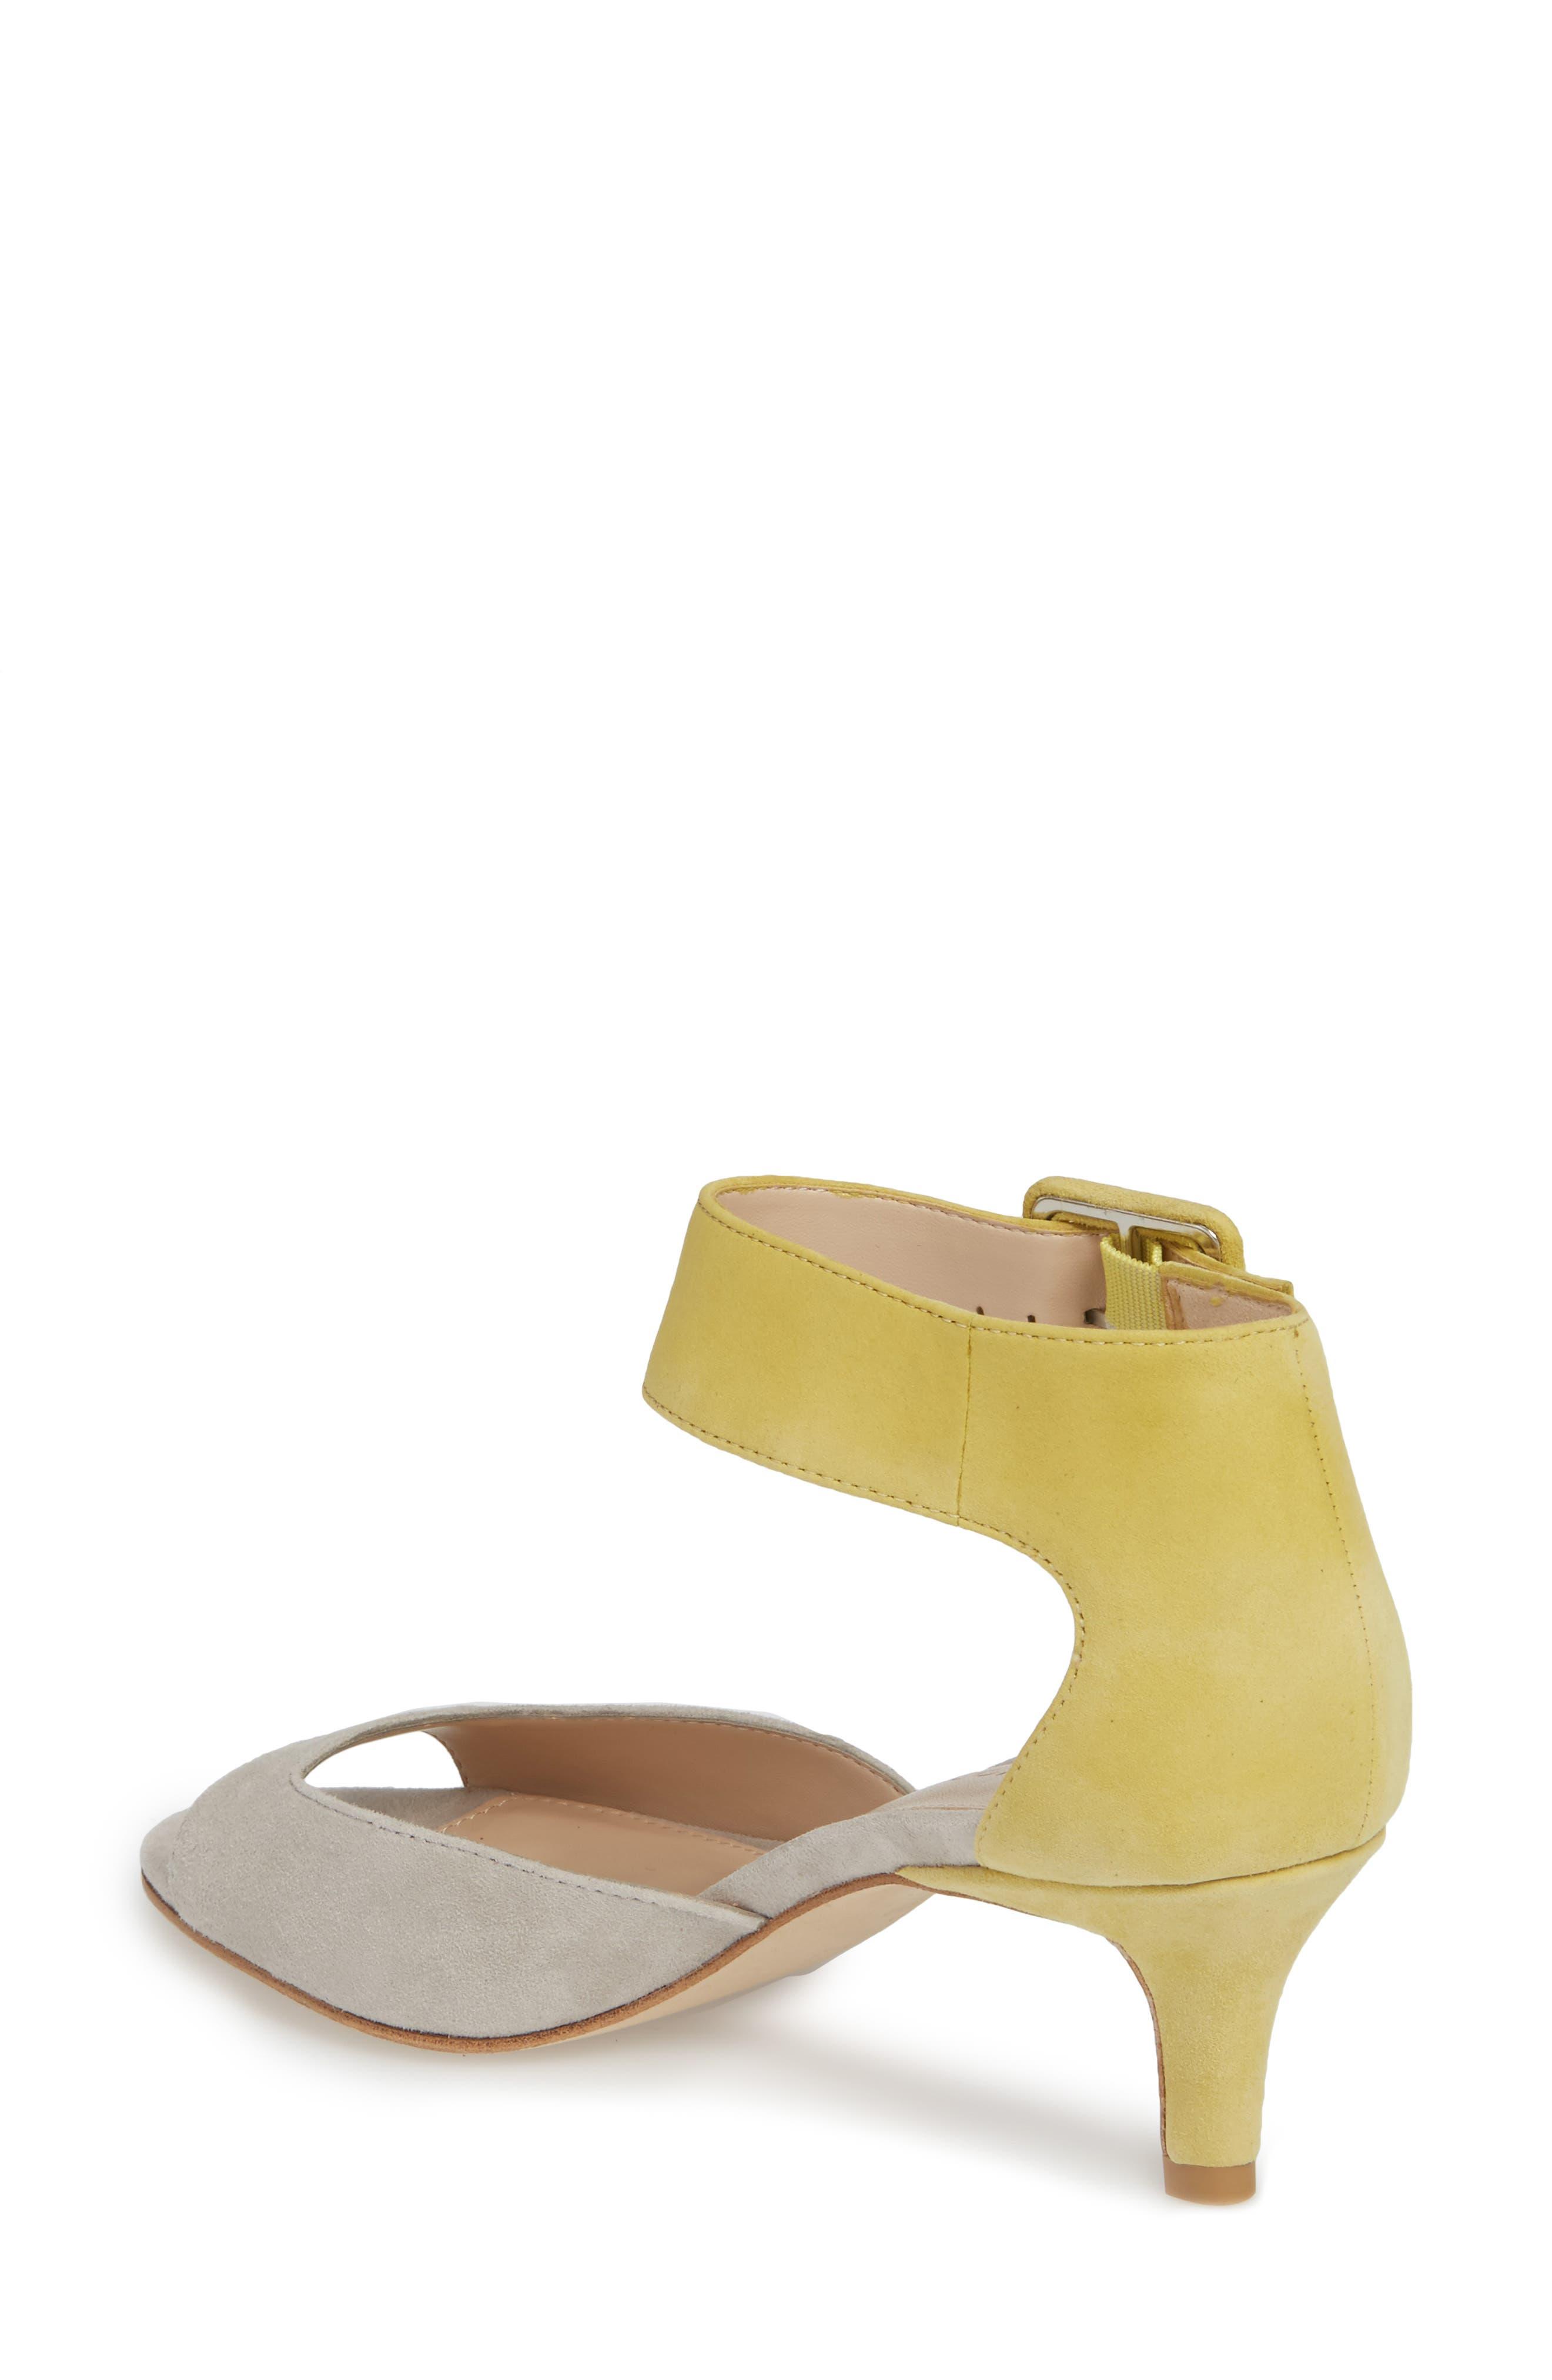 'Berlin' Ankle Strap Sandal,                             Alternate thumbnail 12, color,